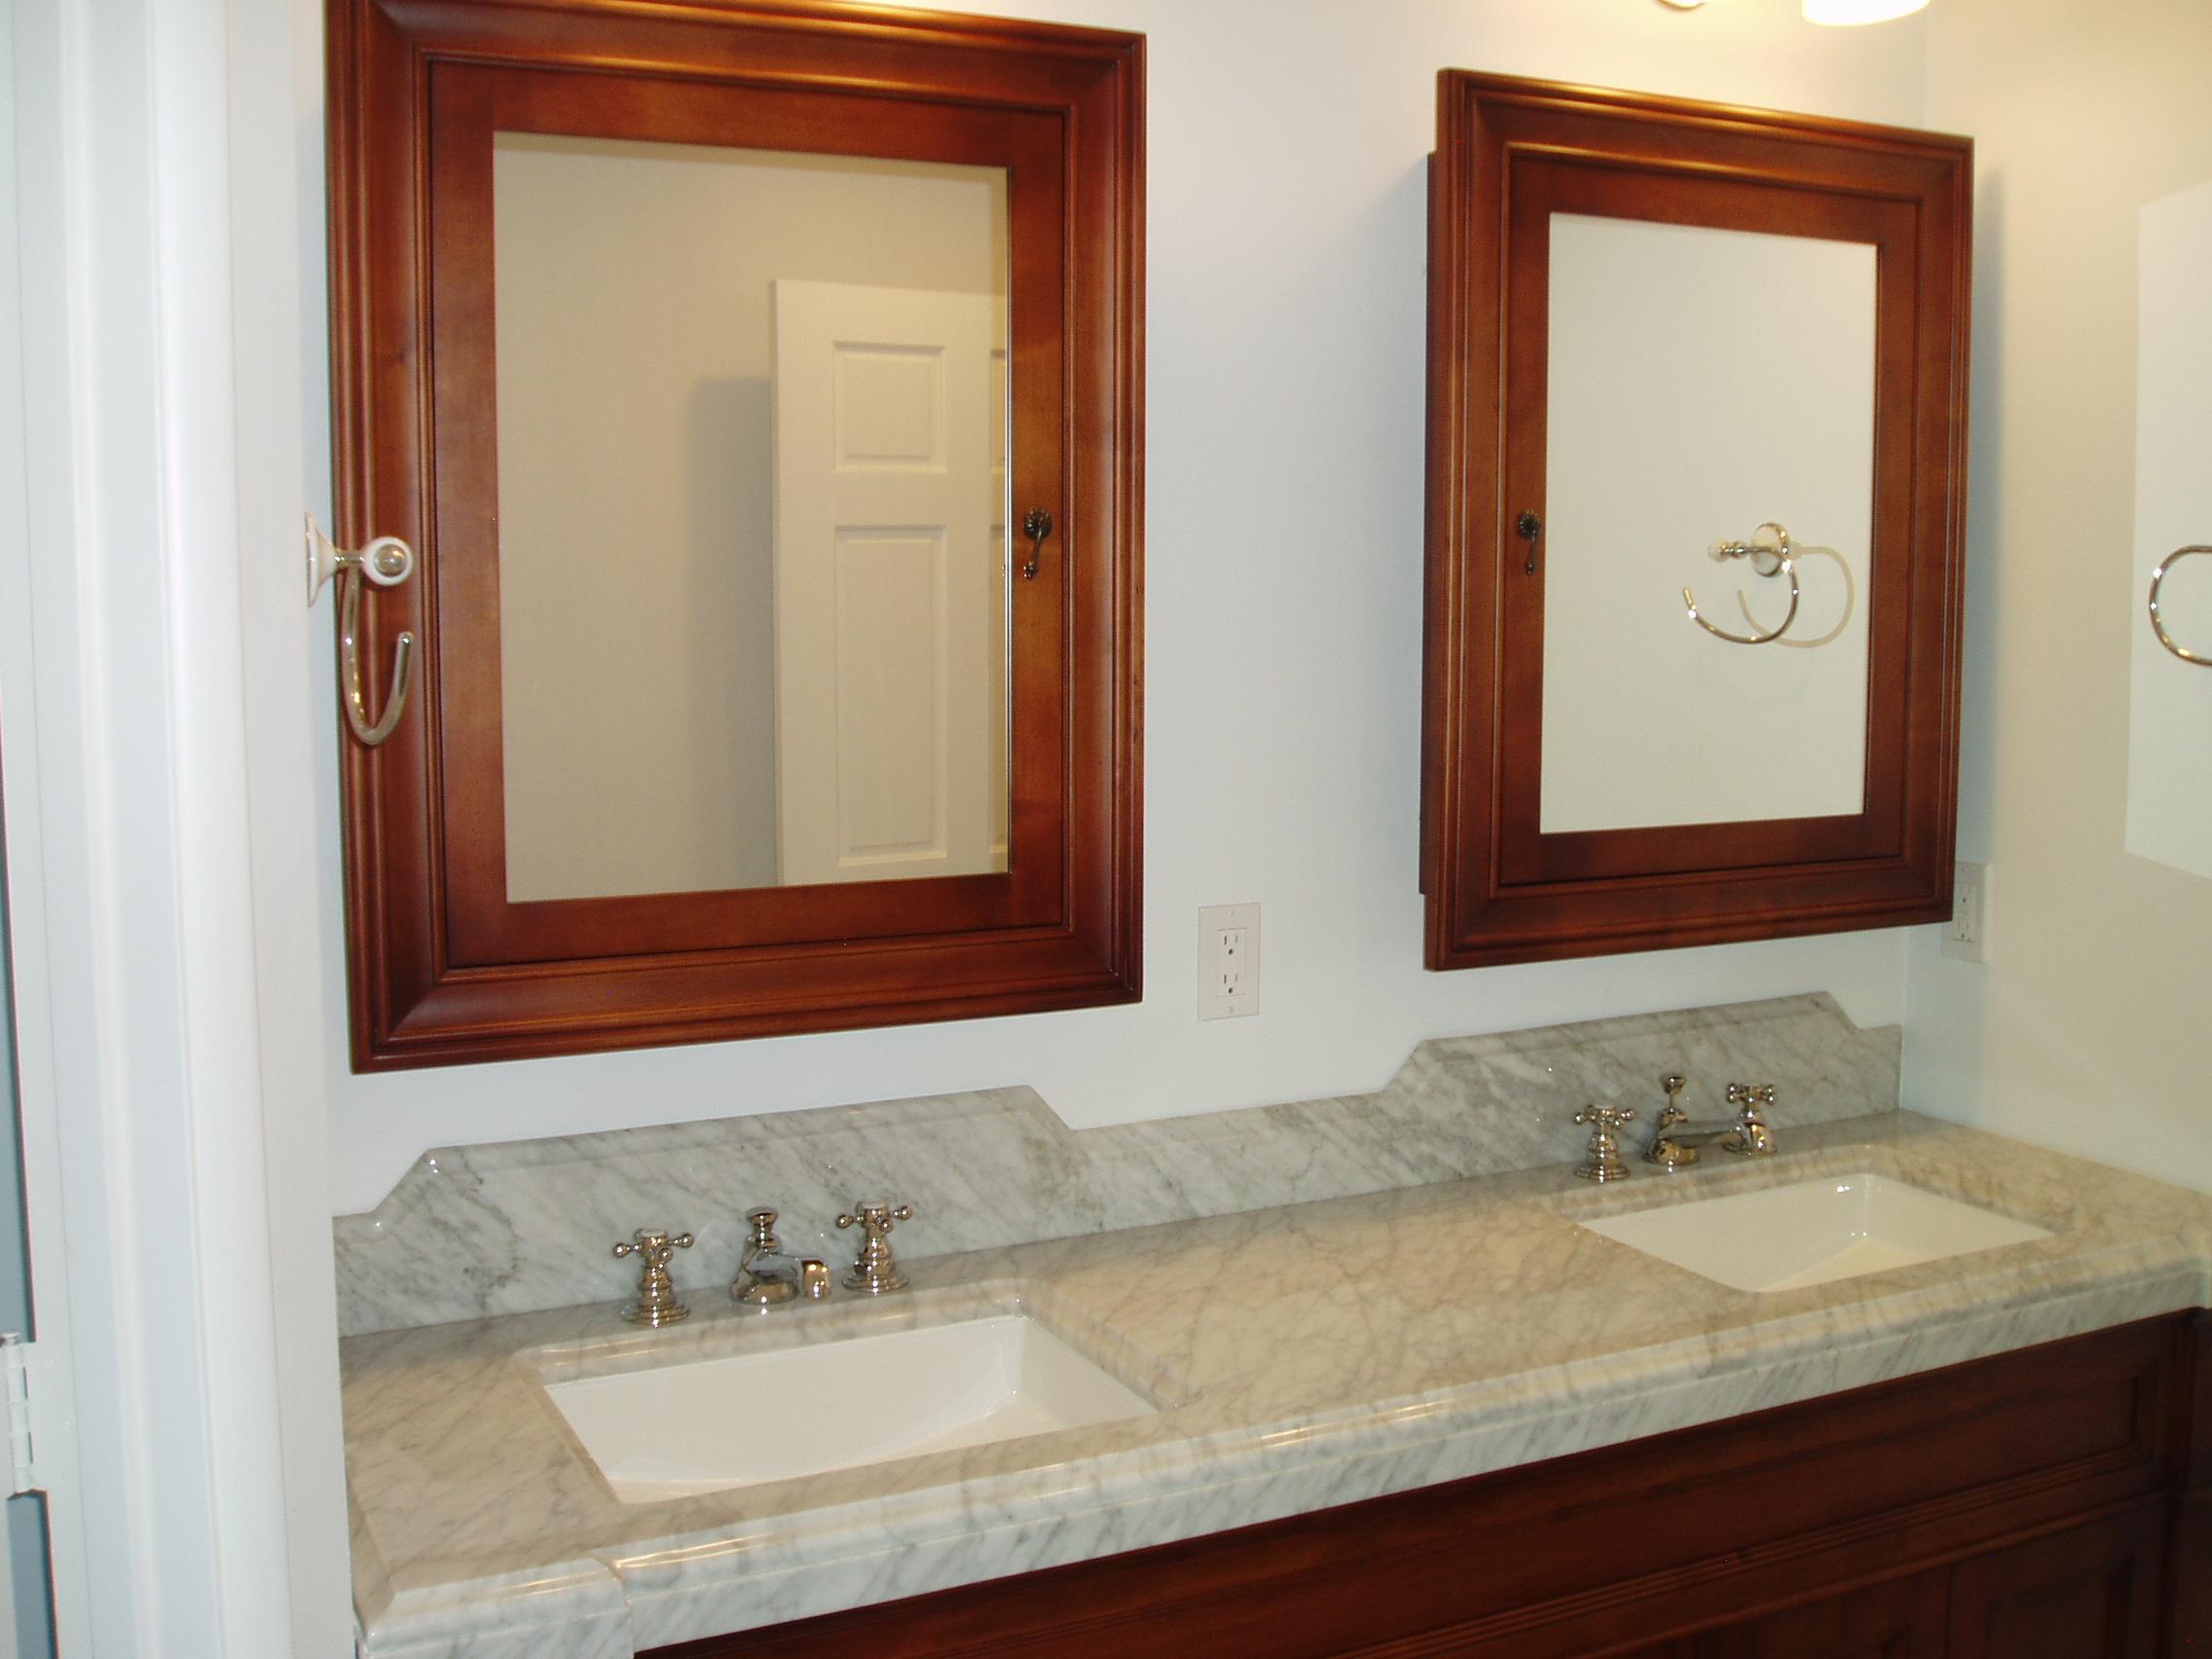 double vanity.JPG